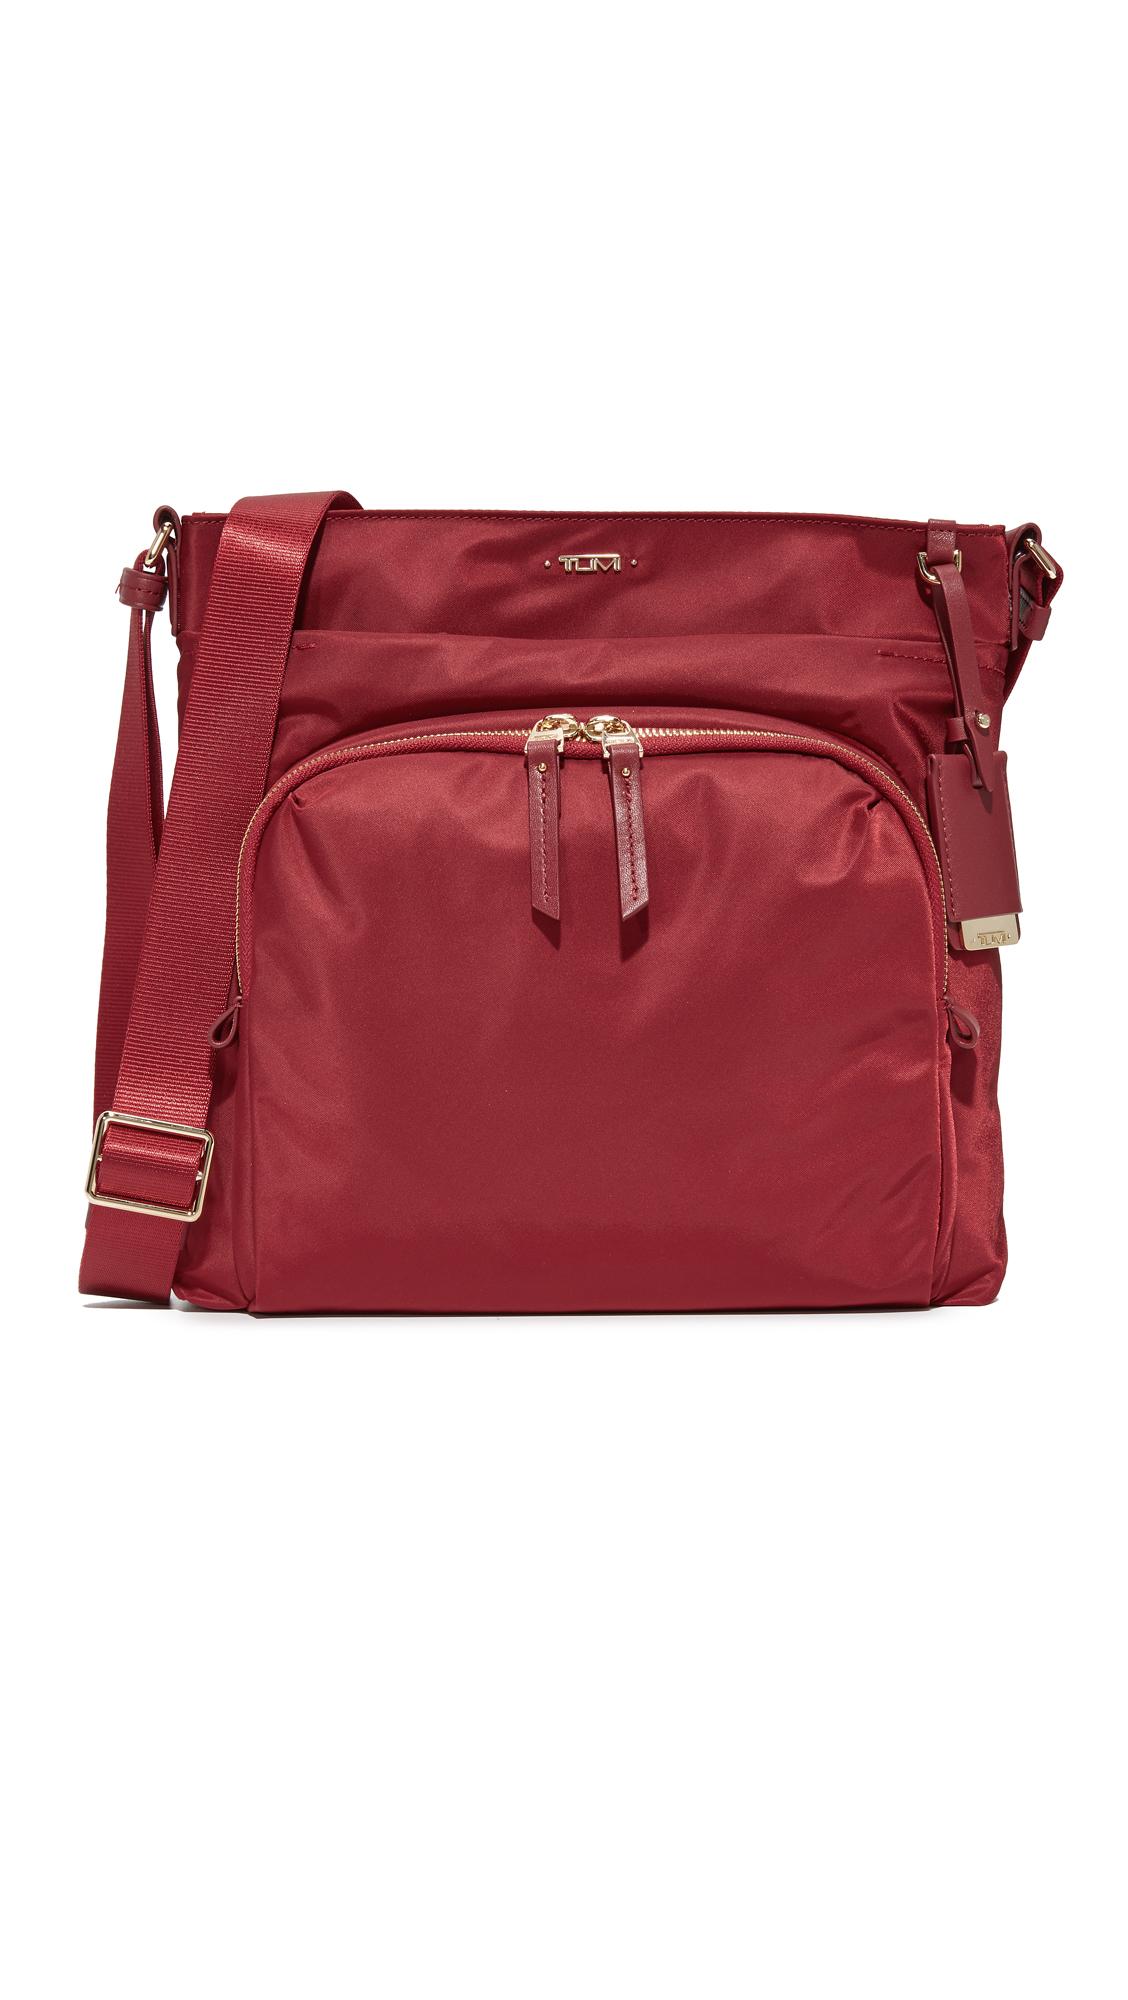 Tumi Capri Cross Body Bag - Crimson